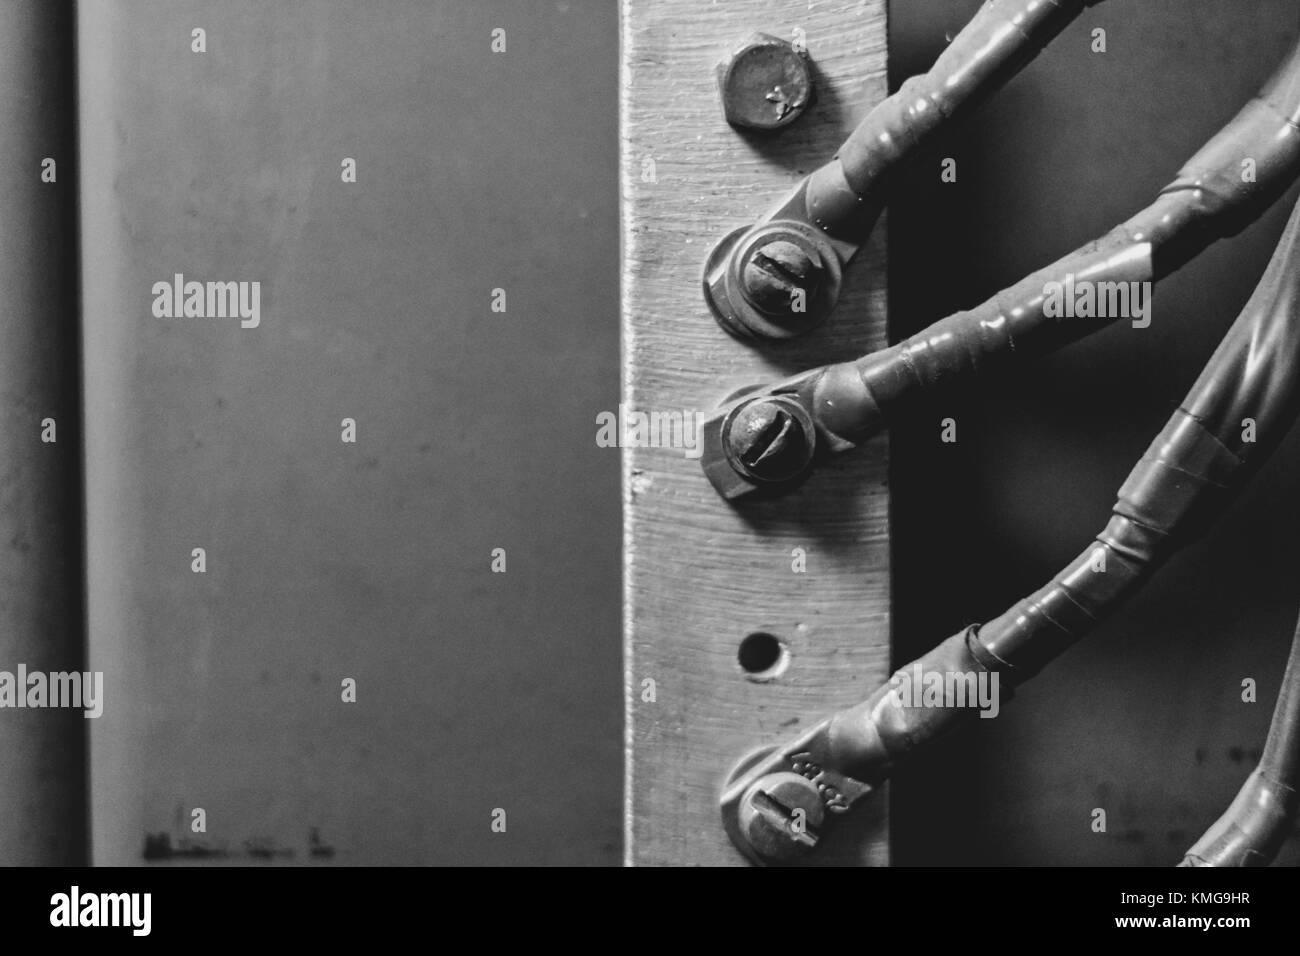 Three Switches Stockfotos & Three Switches Bilder - Alamy